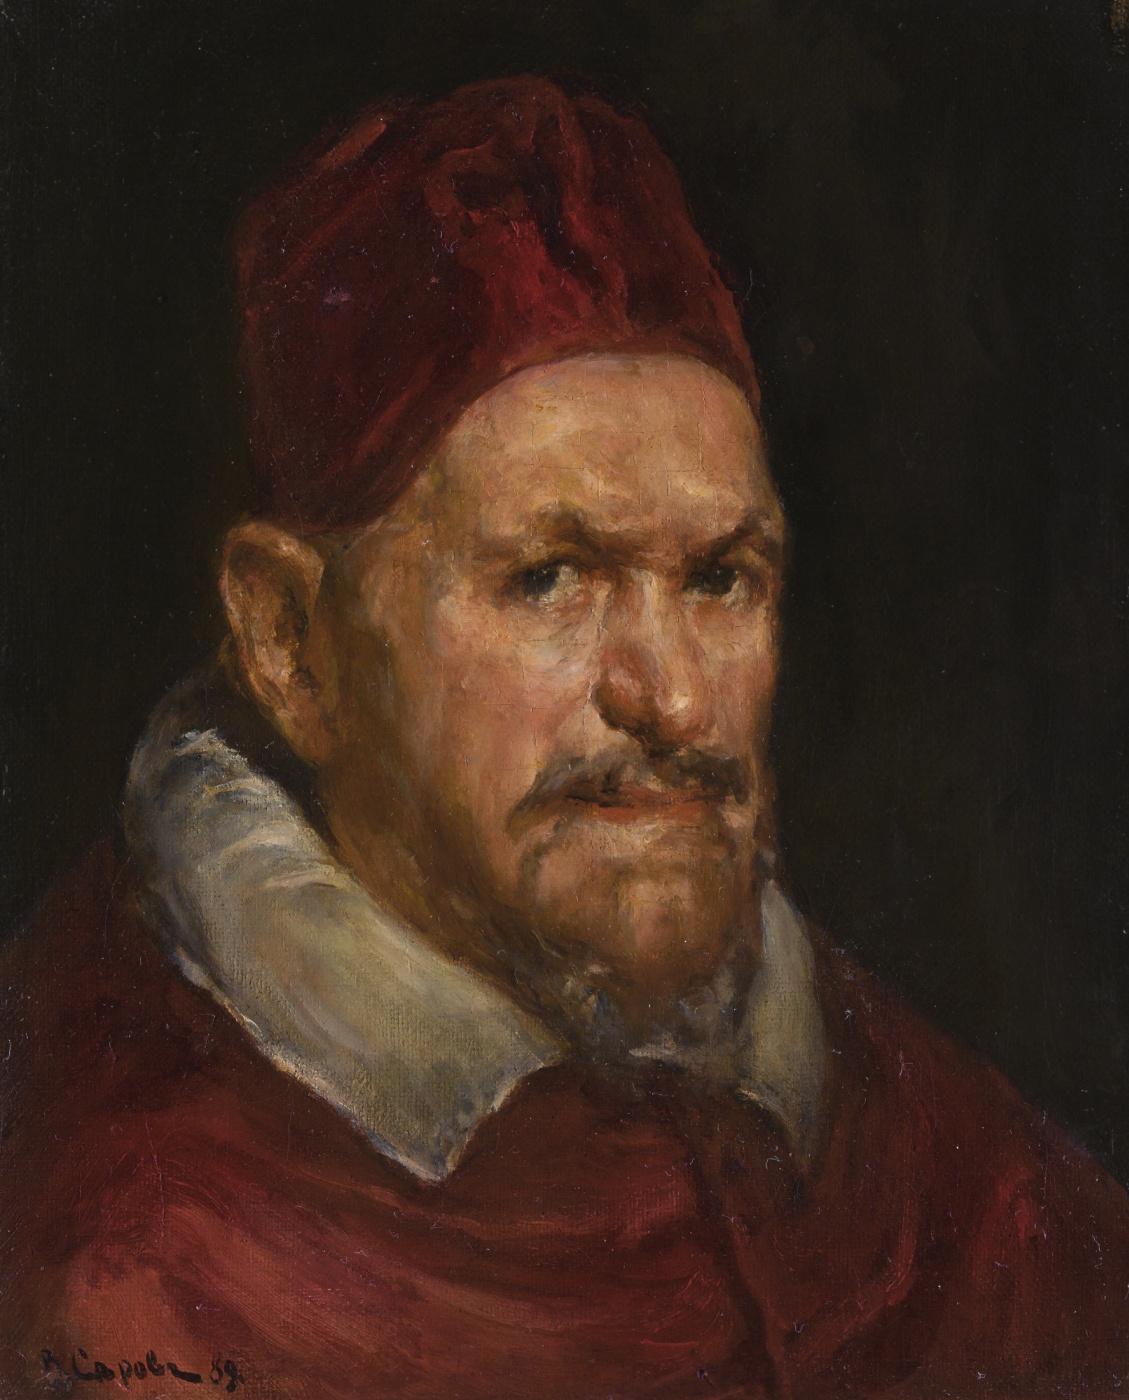 Valentin Serov. Portrait of Pope Innokentija the (copy of the painting by Velasquez)